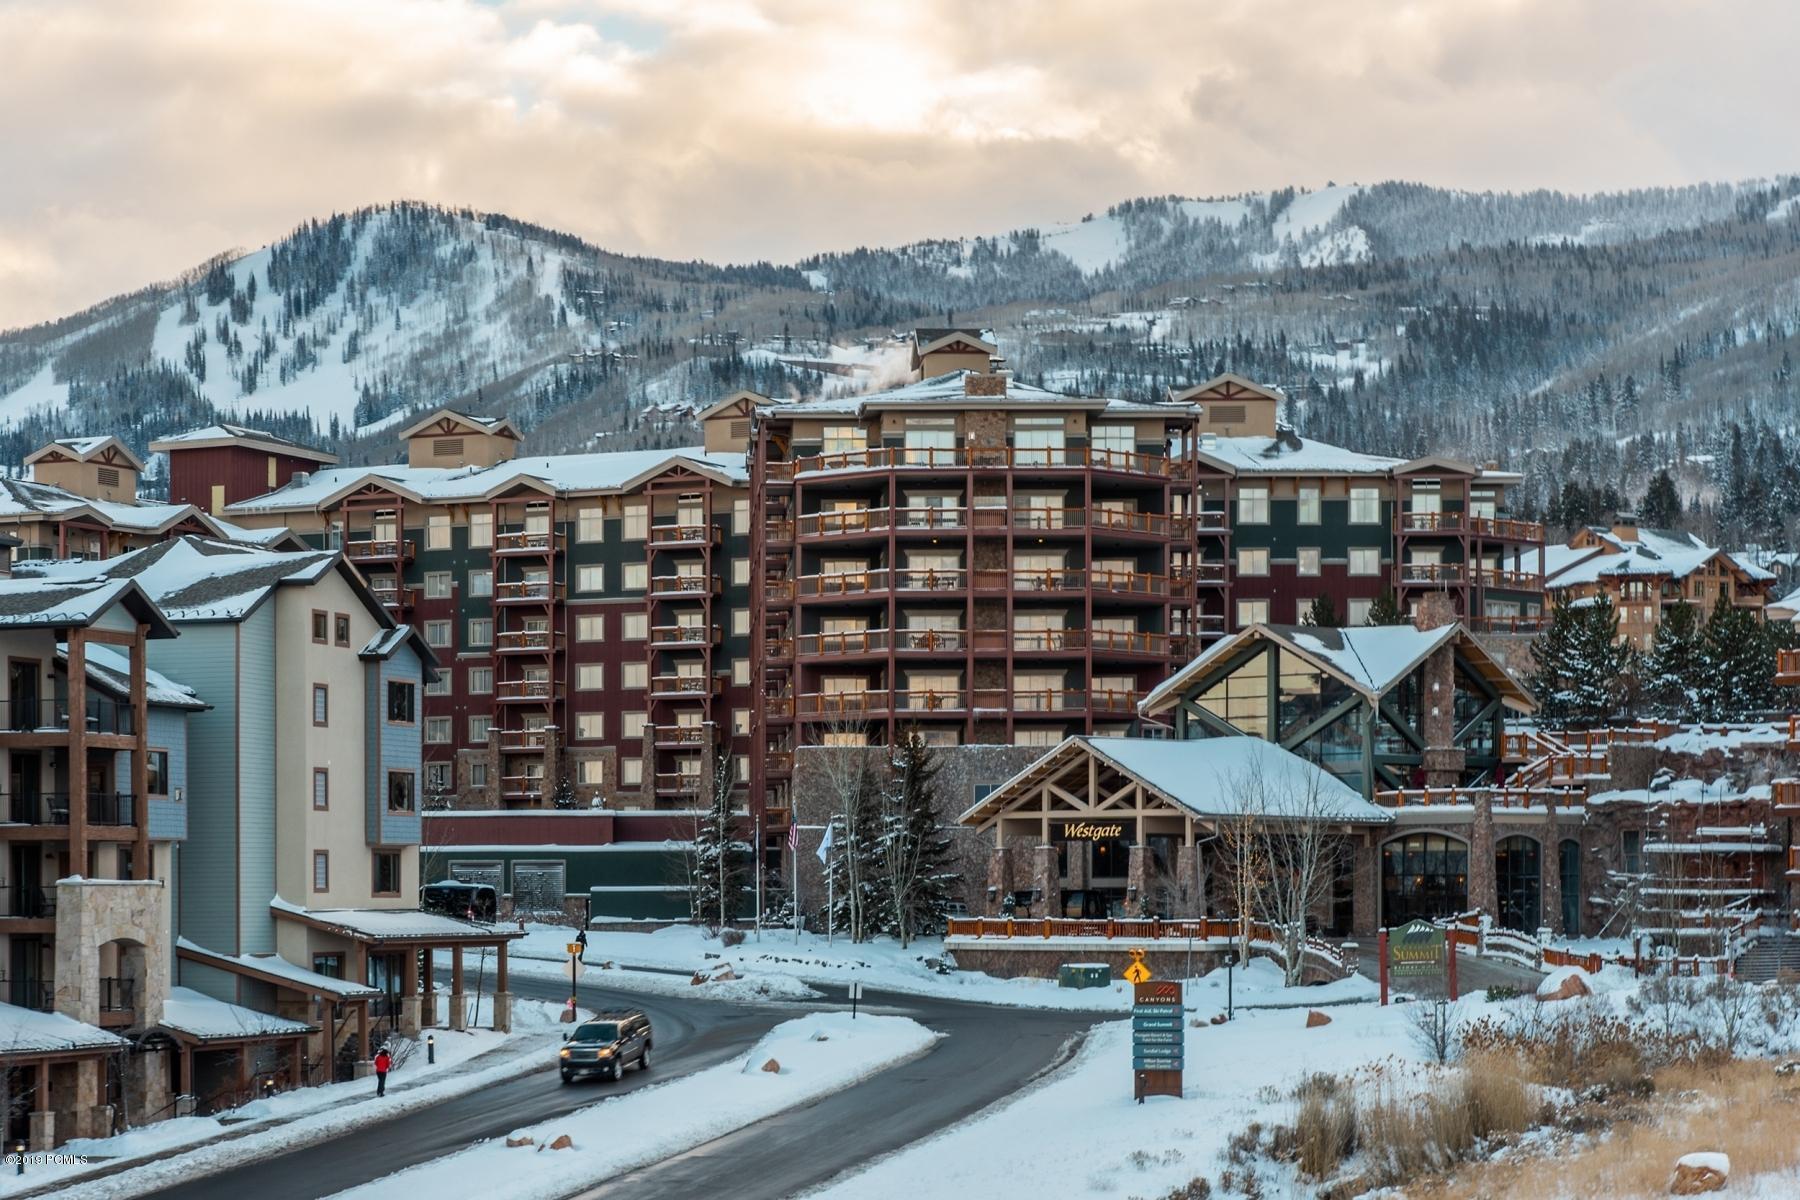 3000 Canyons Resort Drive, Park City, Utah 84098, 2 Bedrooms Bedrooms, ,2 BathroomsBathrooms,Condominium,For Sale,Canyons Resort,20190109112430415765000000